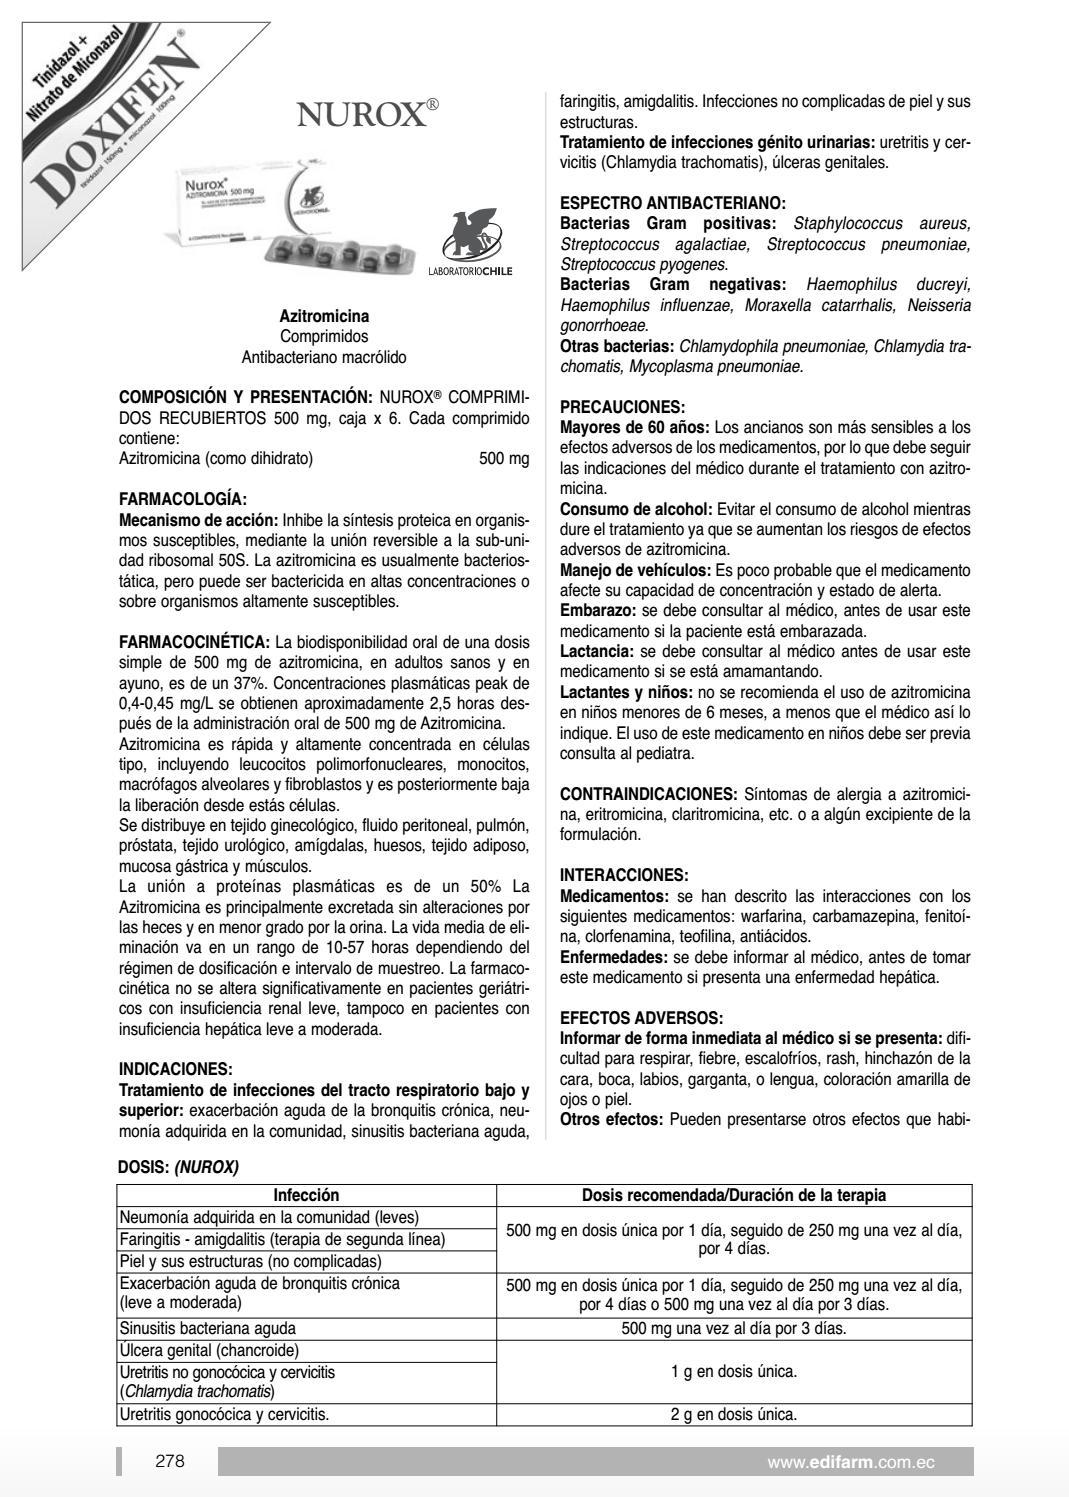 azitromicina uretritis gonococica